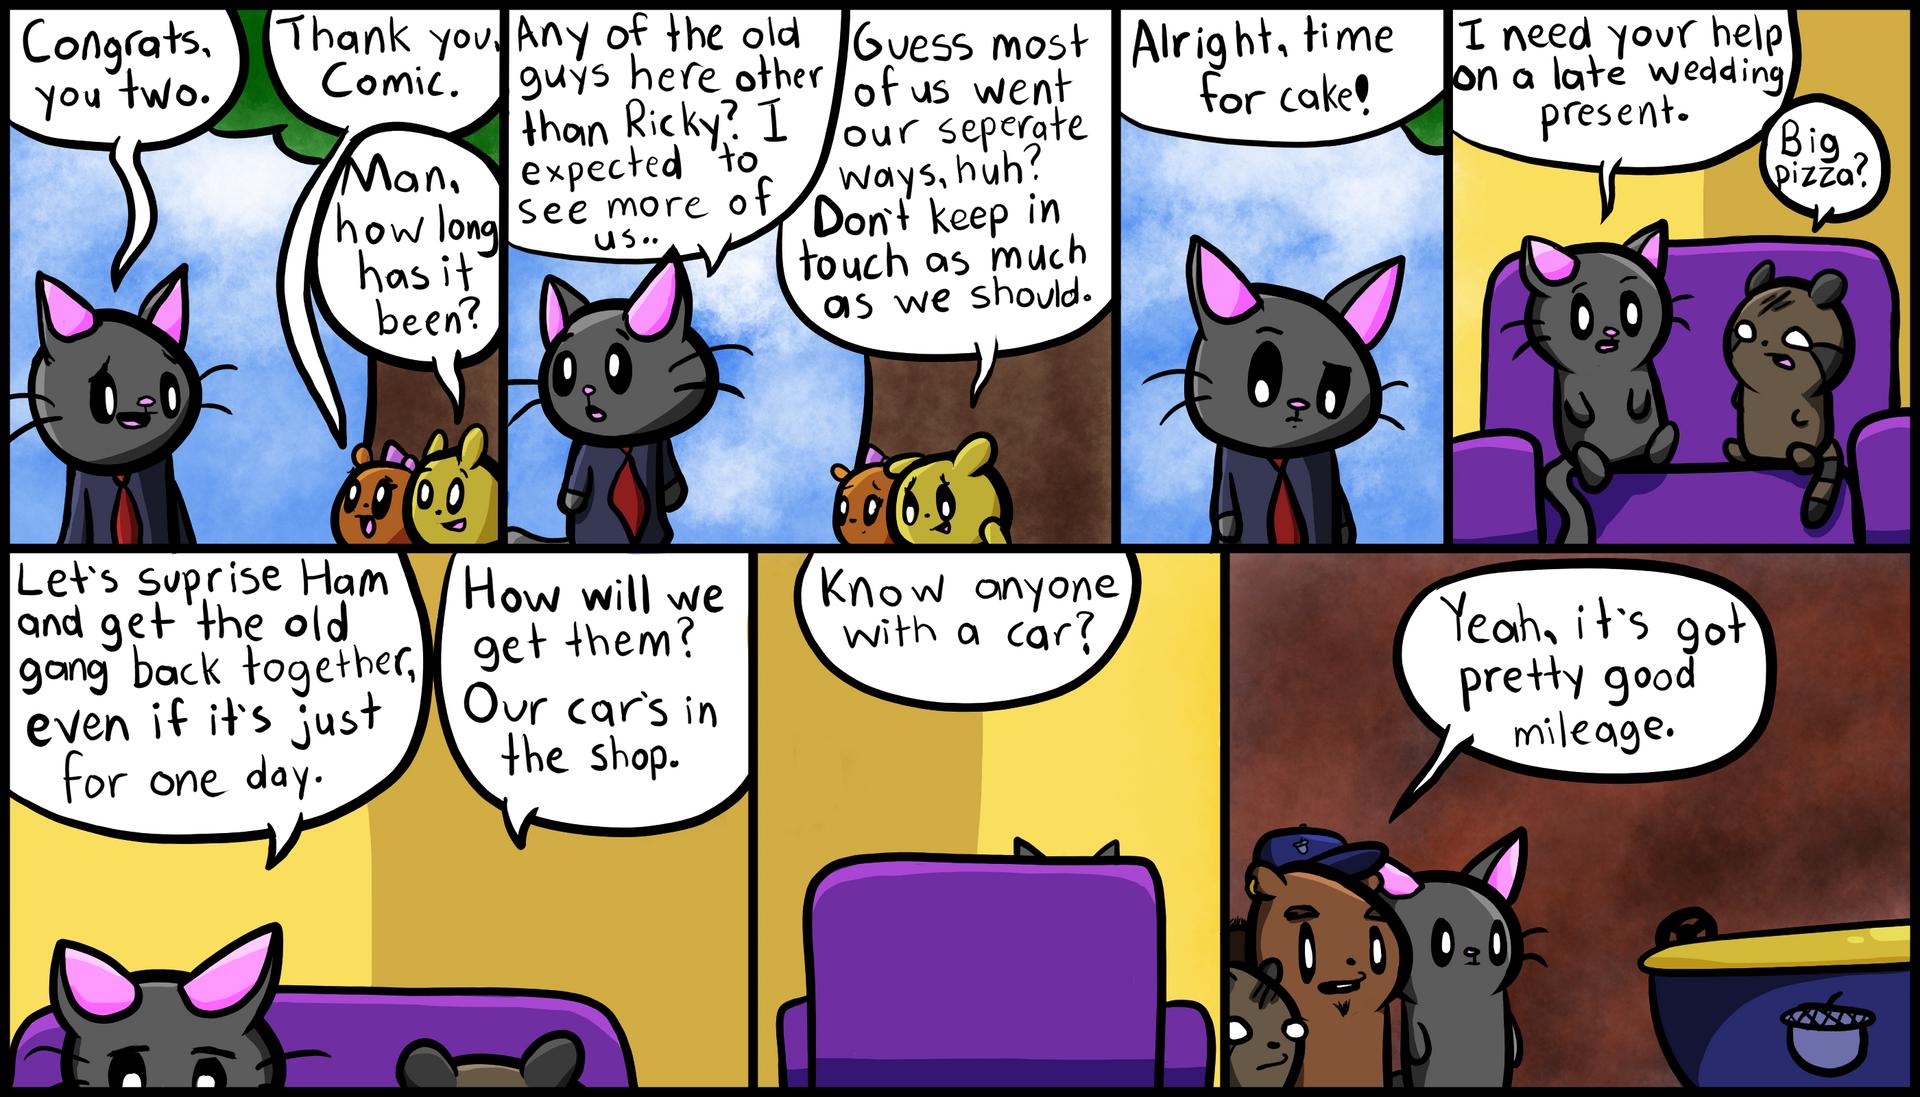 Comic's Plan